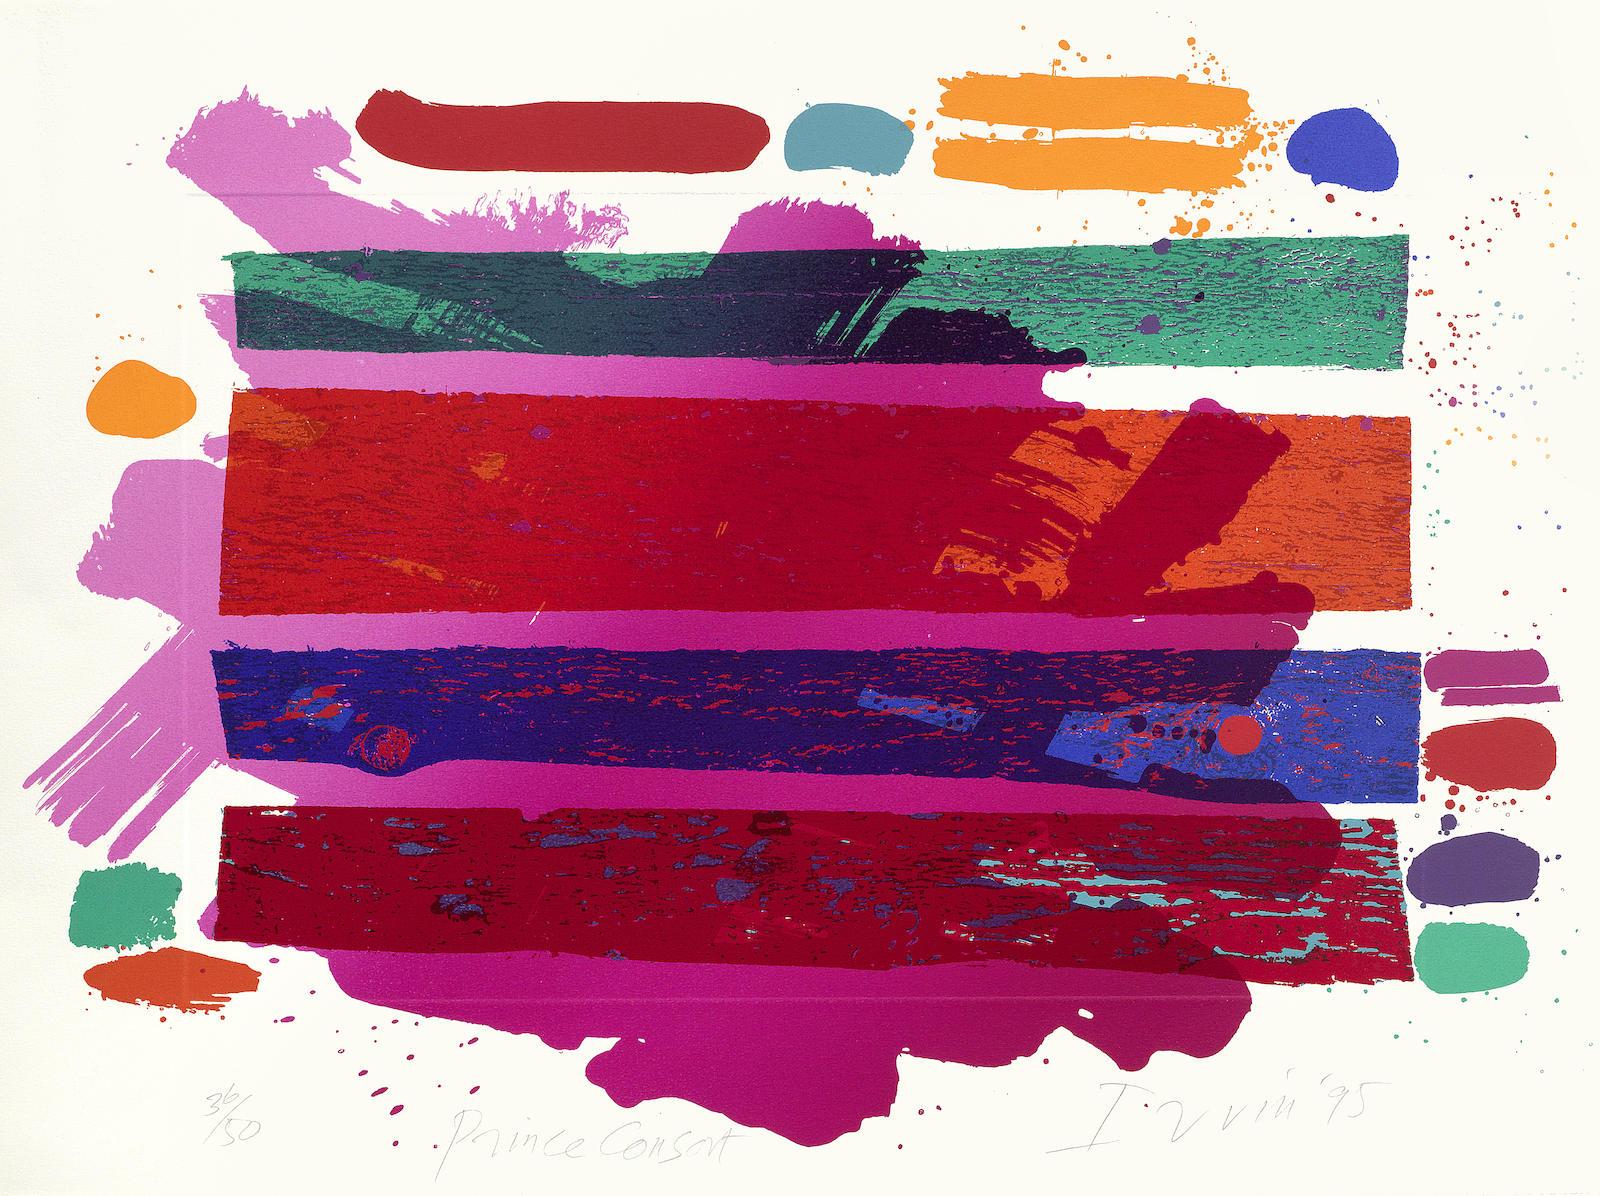 Eduardo Paolozzi-Albert Irvin-Elisabeth Frink-Various Artists - A Collection of Modern British Prints (Including Albert Irvin 'Prince Consort', from Royal College of Art's 'Six Artists' portfolio; Elisabeth Frink 'Coriolanus' (W.1); Eduardo Paolozzi 'Les Chants de Maldoror, Ducasse', from Royal College of Art's 'Six Artists' portfolio and two prints from the from Royal College of Art's 'Thirty Five Artists' portfolio, 1982: Norman Ackroyd 'Jackson's Pond'; Paul Huxley 'Untitled')-1995